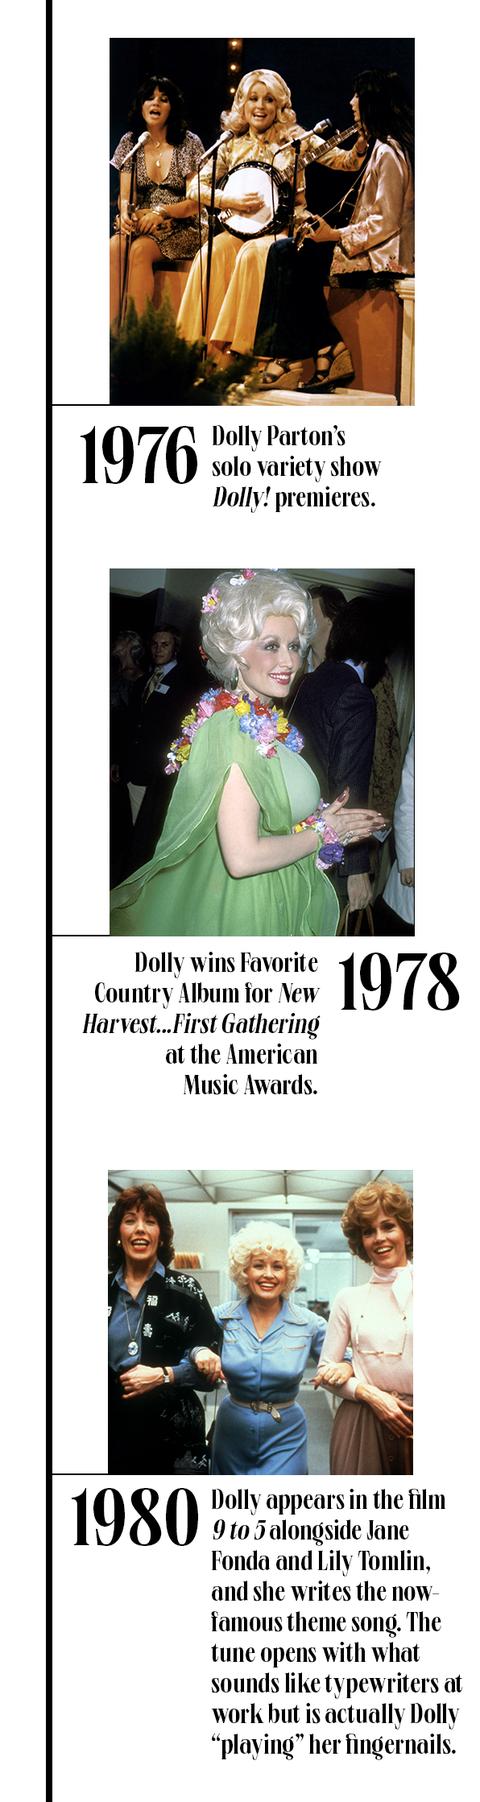 dolly parton timeline 1976 1980